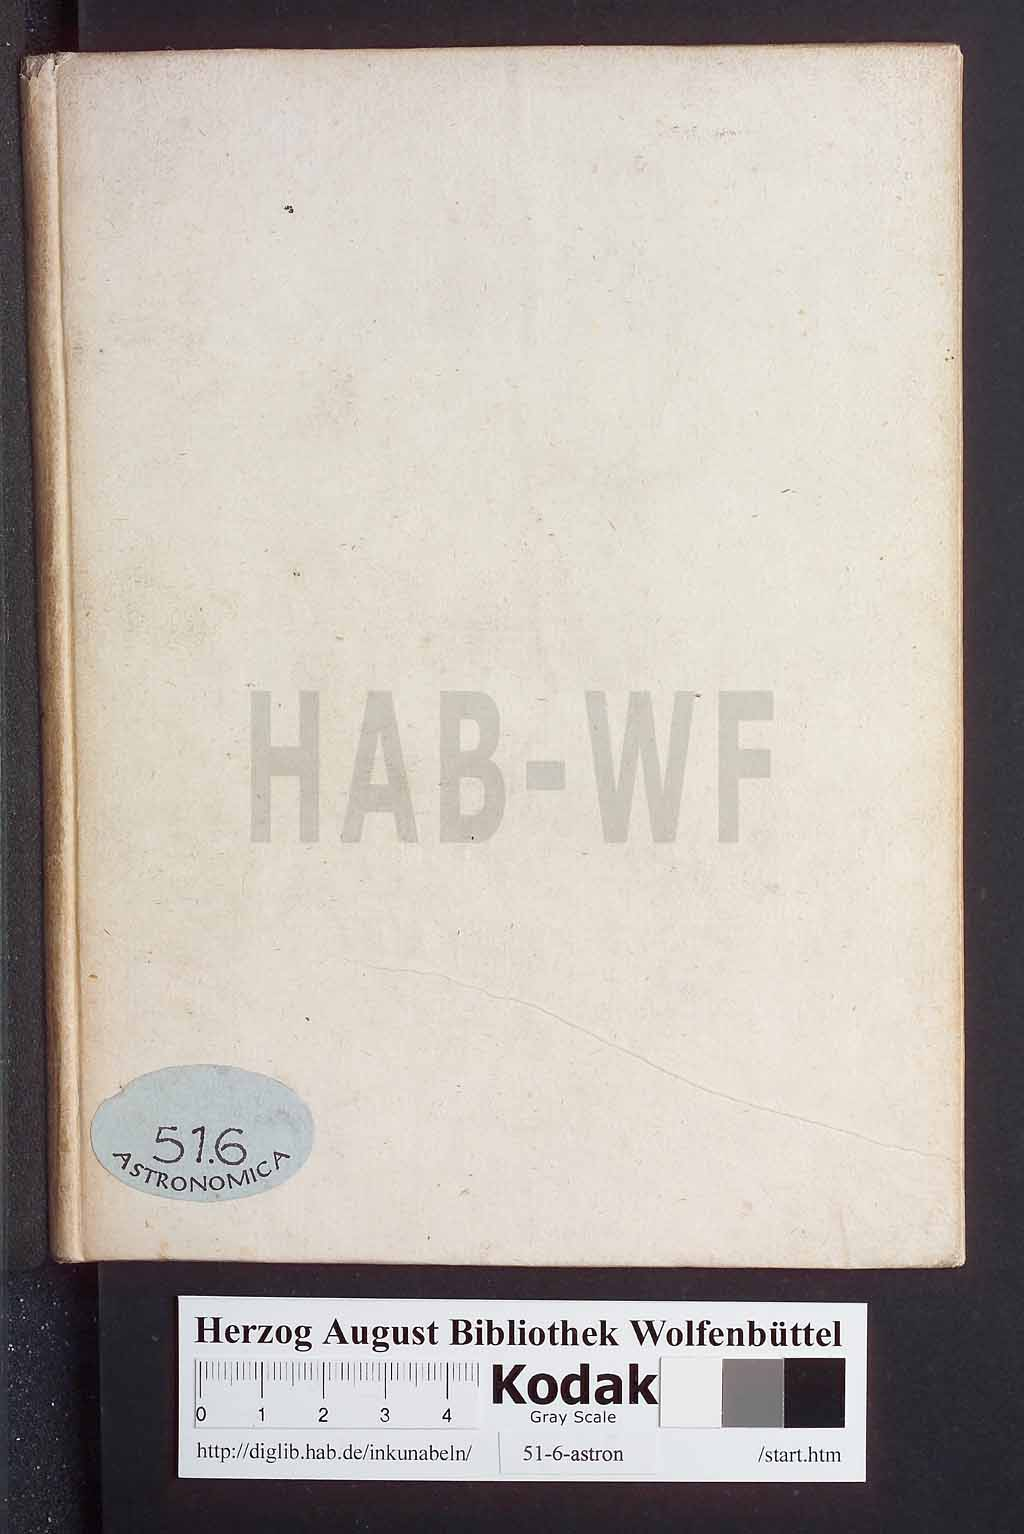 http://diglib.hab.de/inkunabeln/51-6-astron/00001.jpg